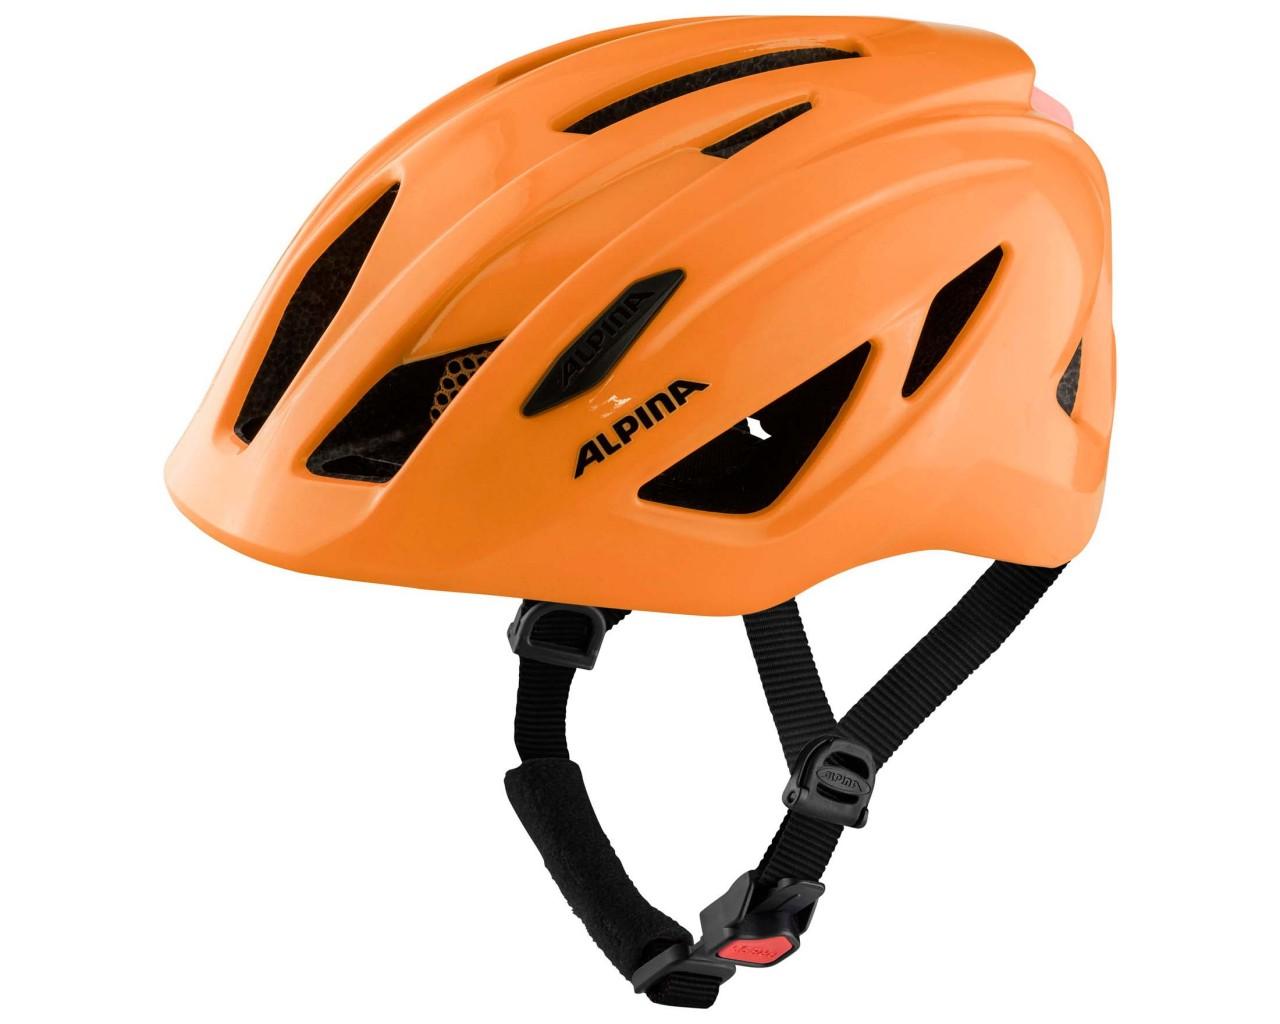 Alpina Pico Flash Kinder Fahrradhelm | neon orange gloss 50-55